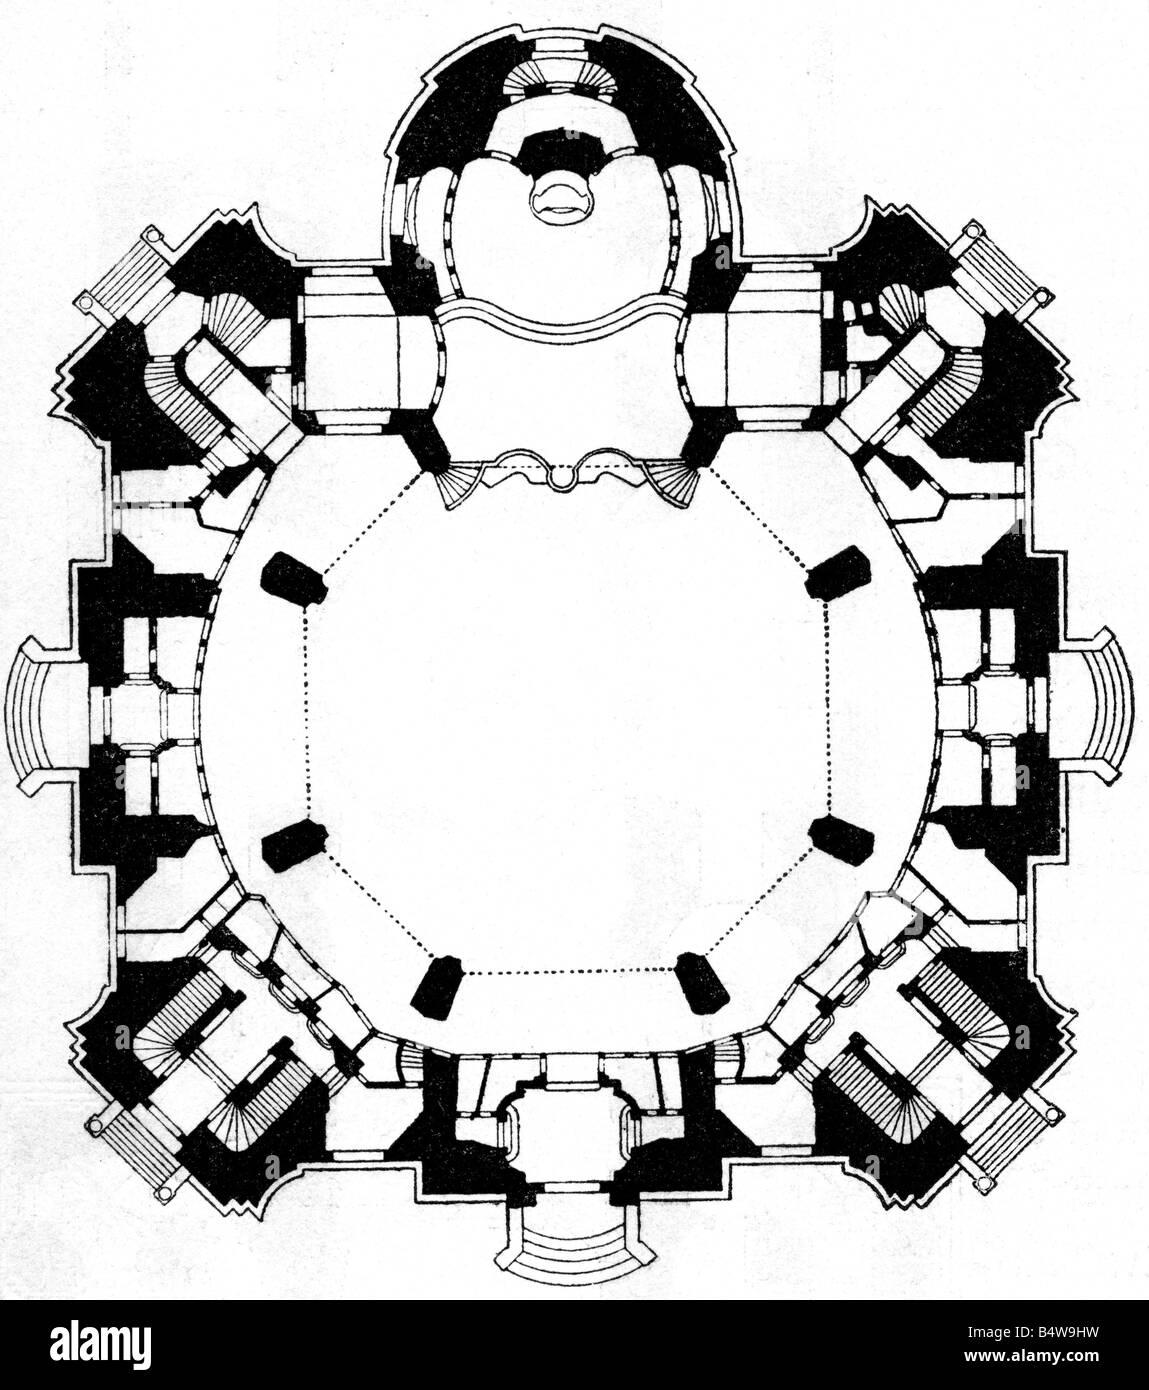 Architecture Floor Plans Dresden Frauenkirche Built